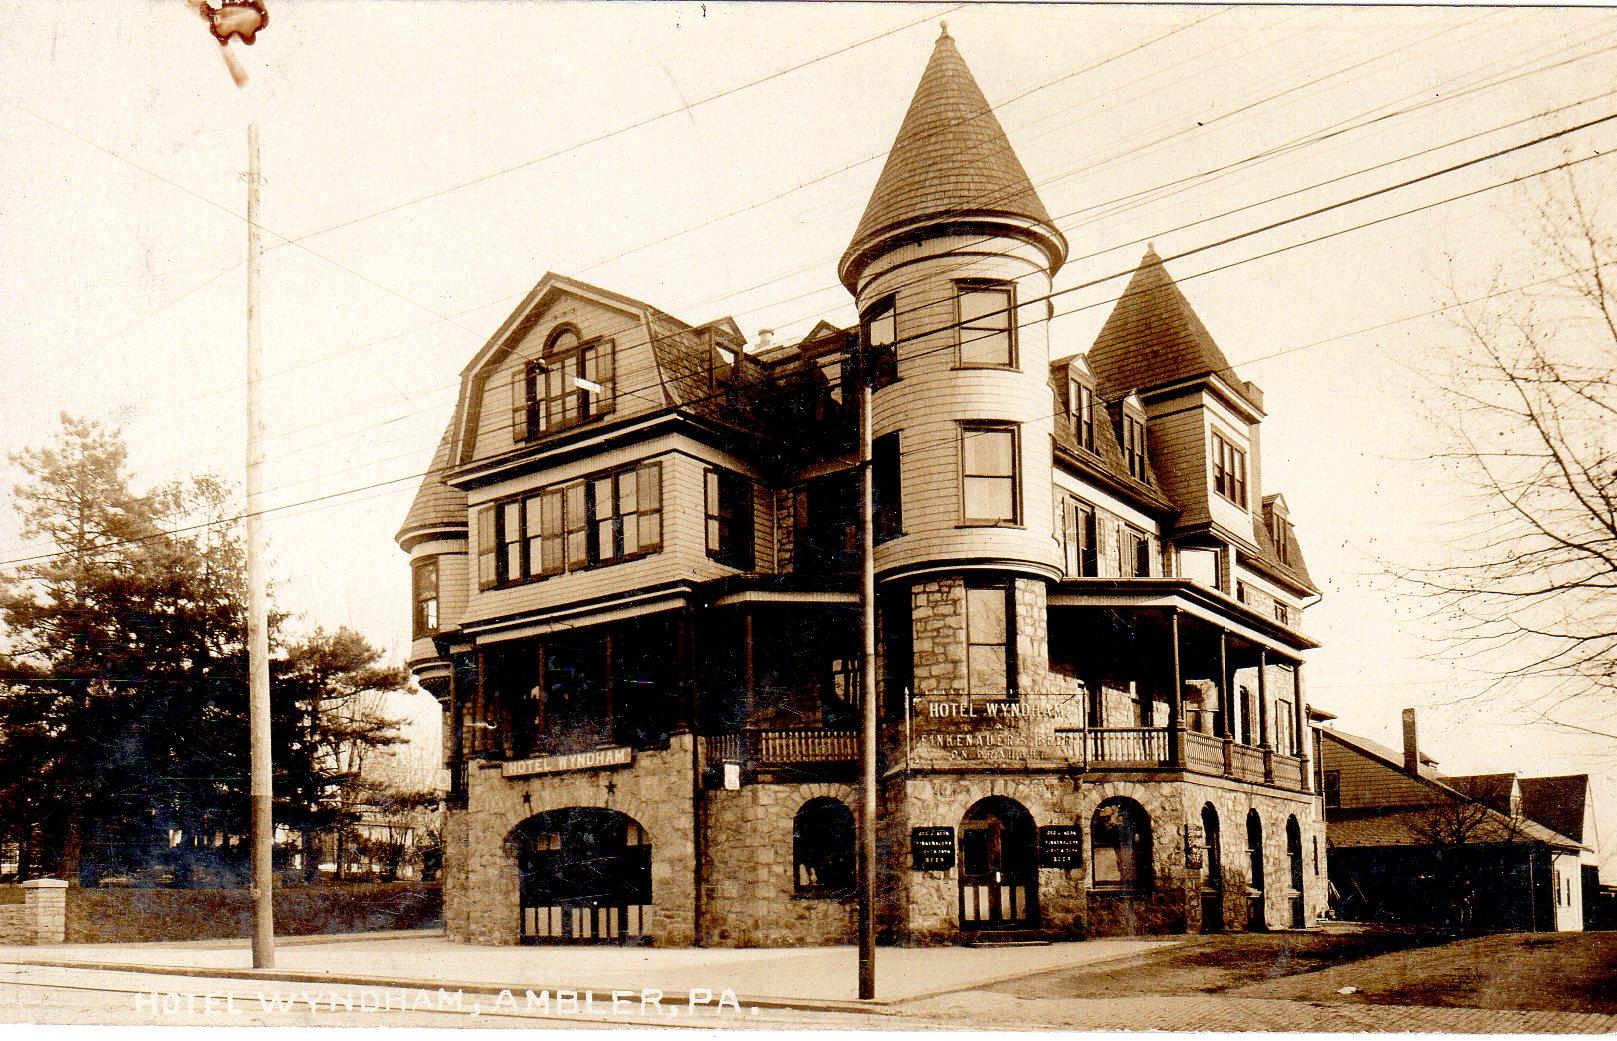 Post Card Collection (E Simon)_2682_42_Hotel Wyndham, Ambler, Pa_23 Sep 1913